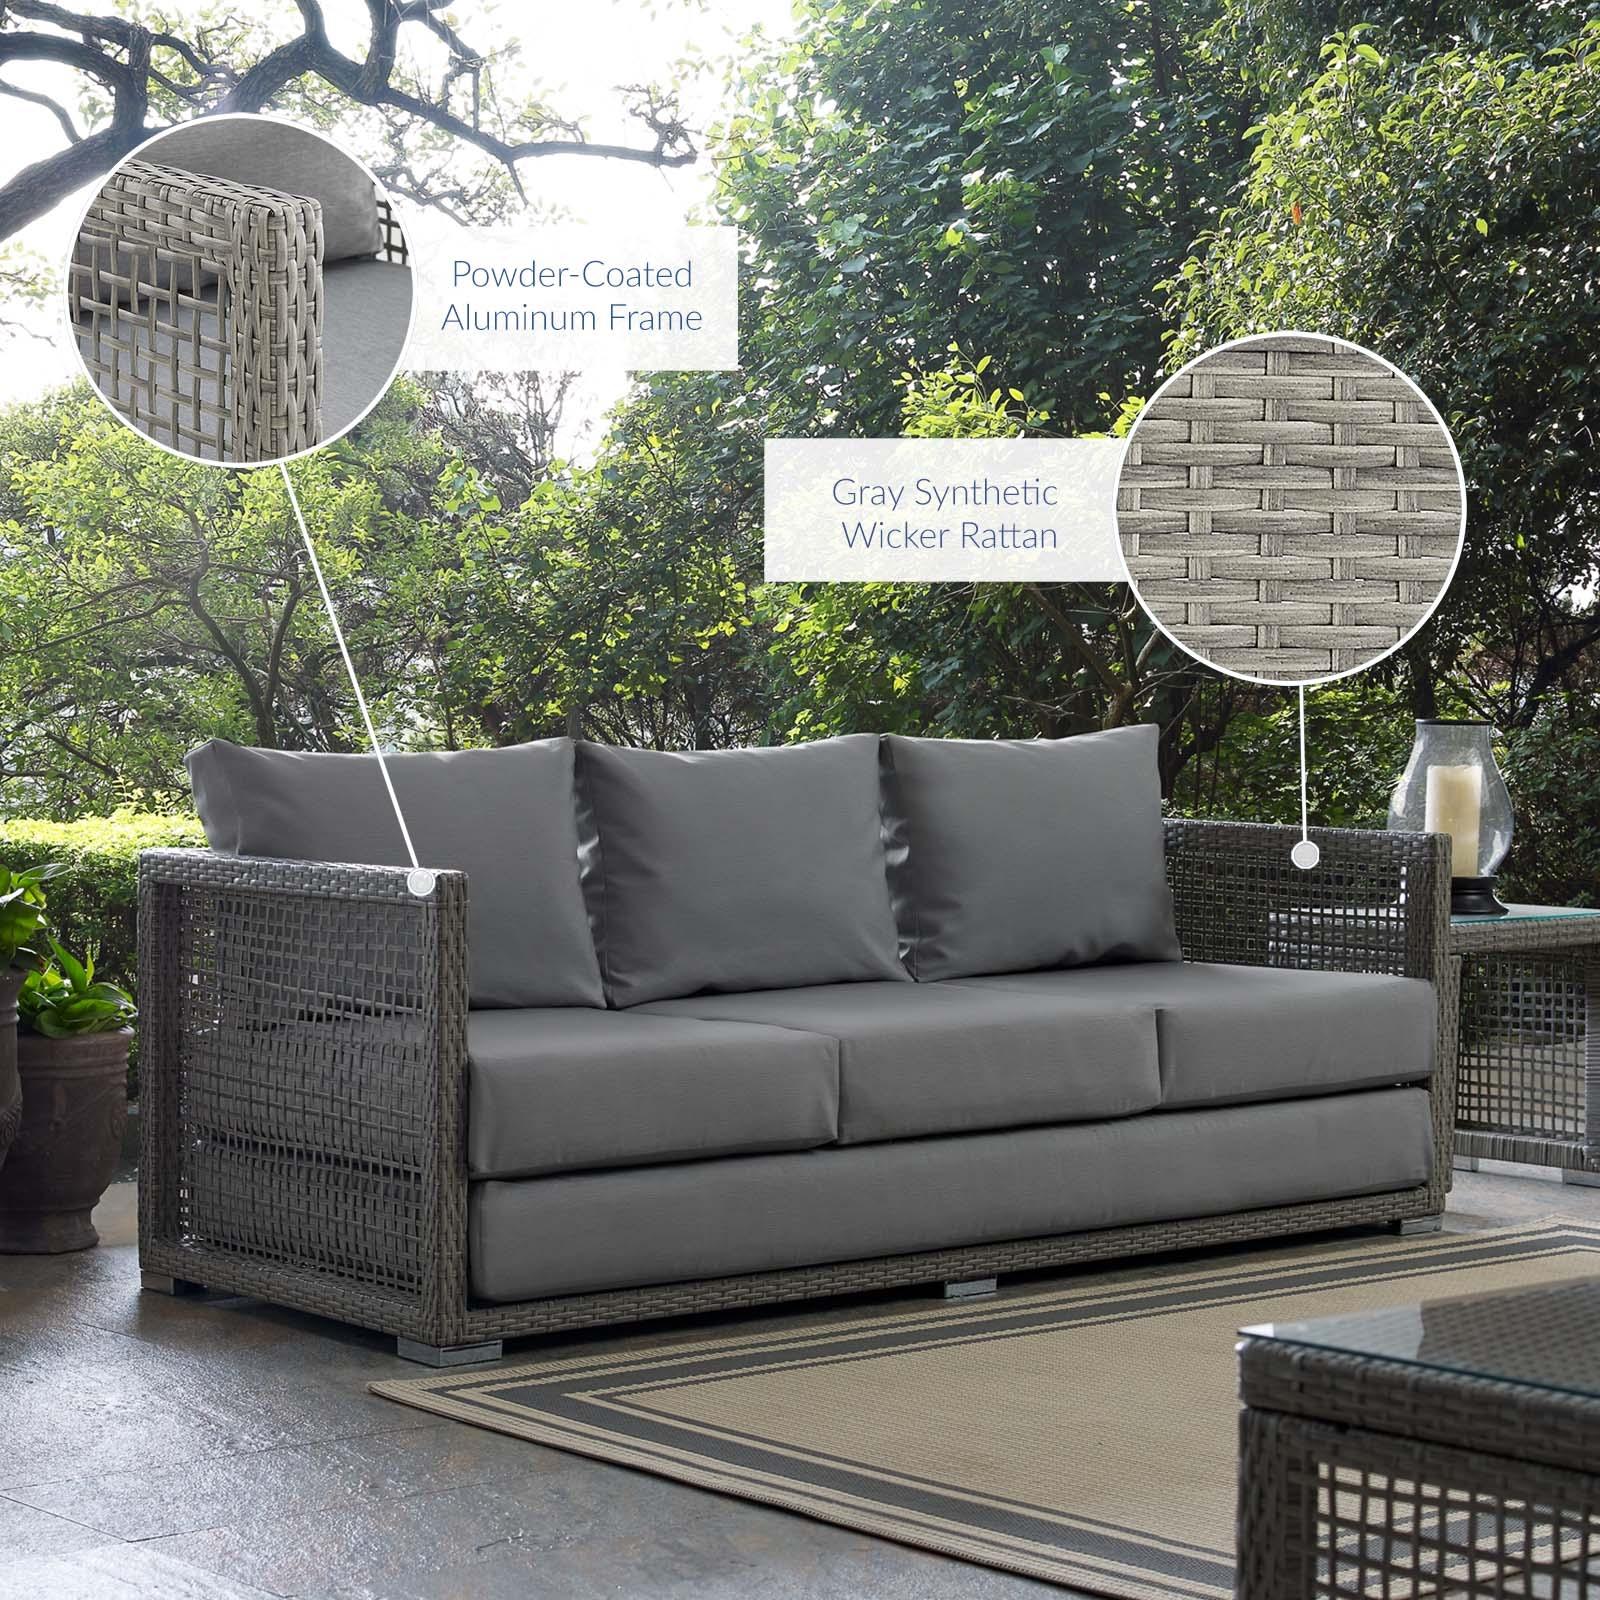 Aura Outdoor Patio Wicker Rattan Sofa in Gray Gray